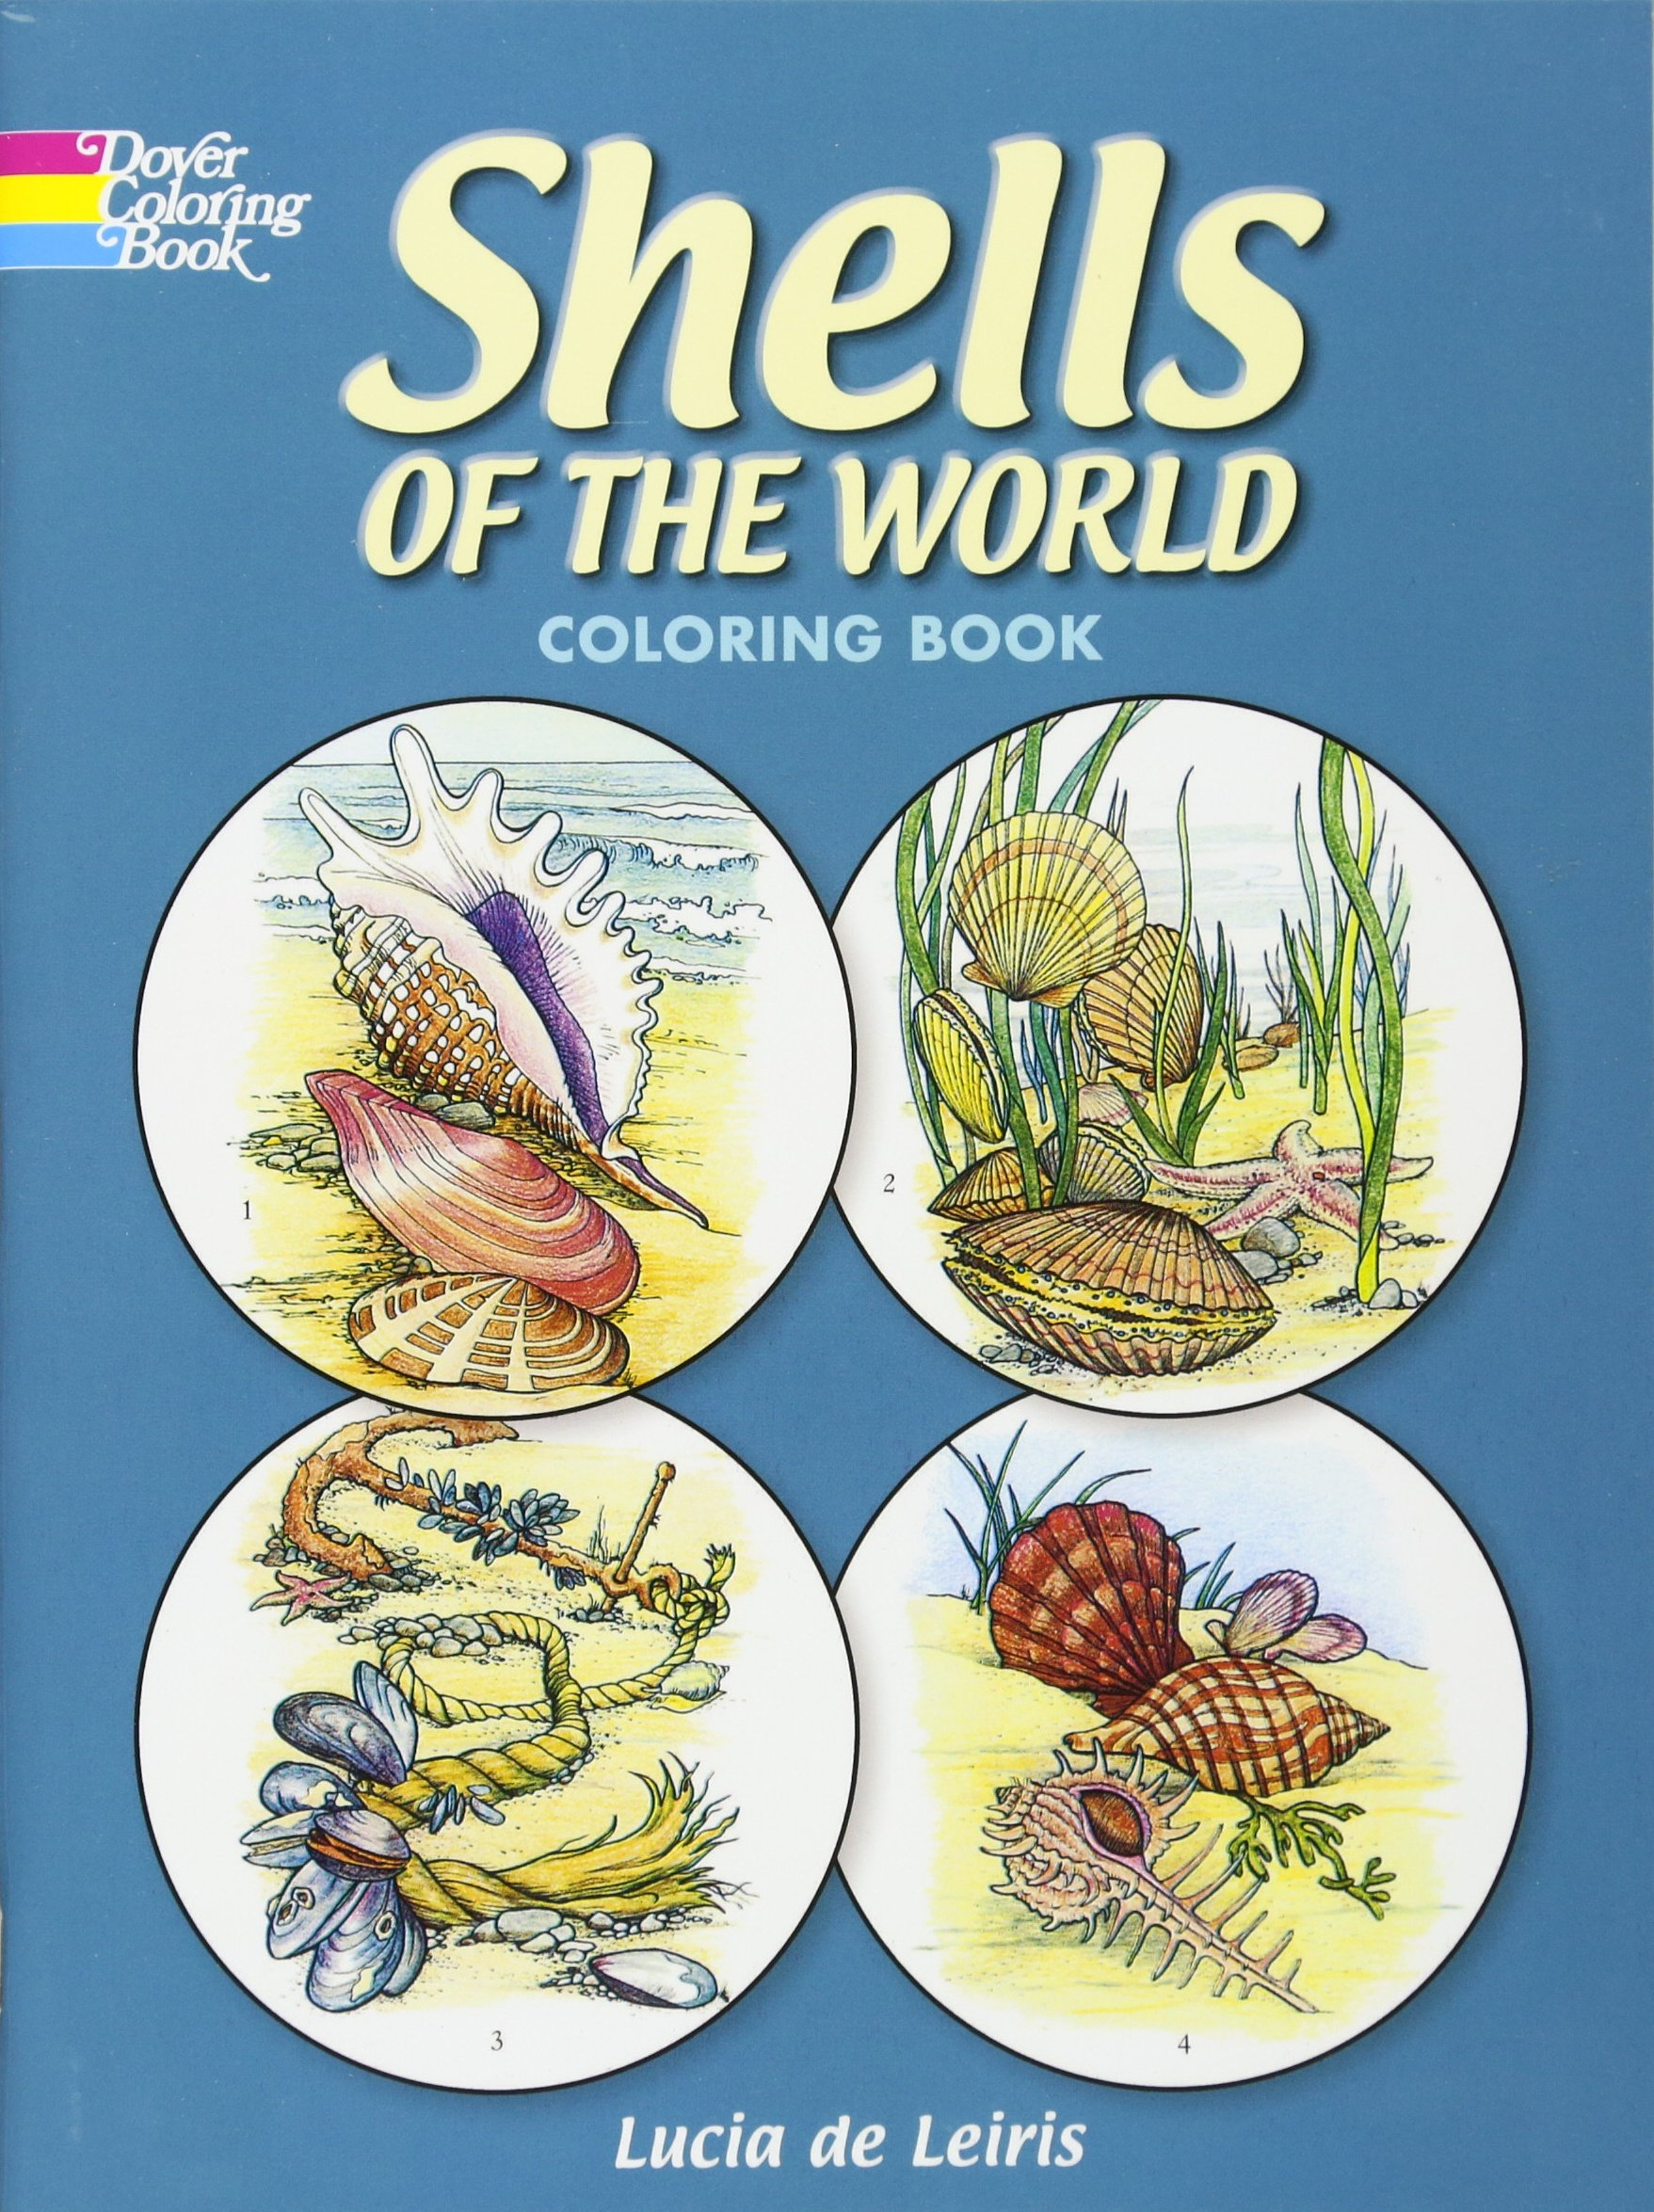 Shells of the World Coloring Book (Dover Nature Coloring Book): Lucia  deLeiris: 9780486243689: Amazon.com: Books